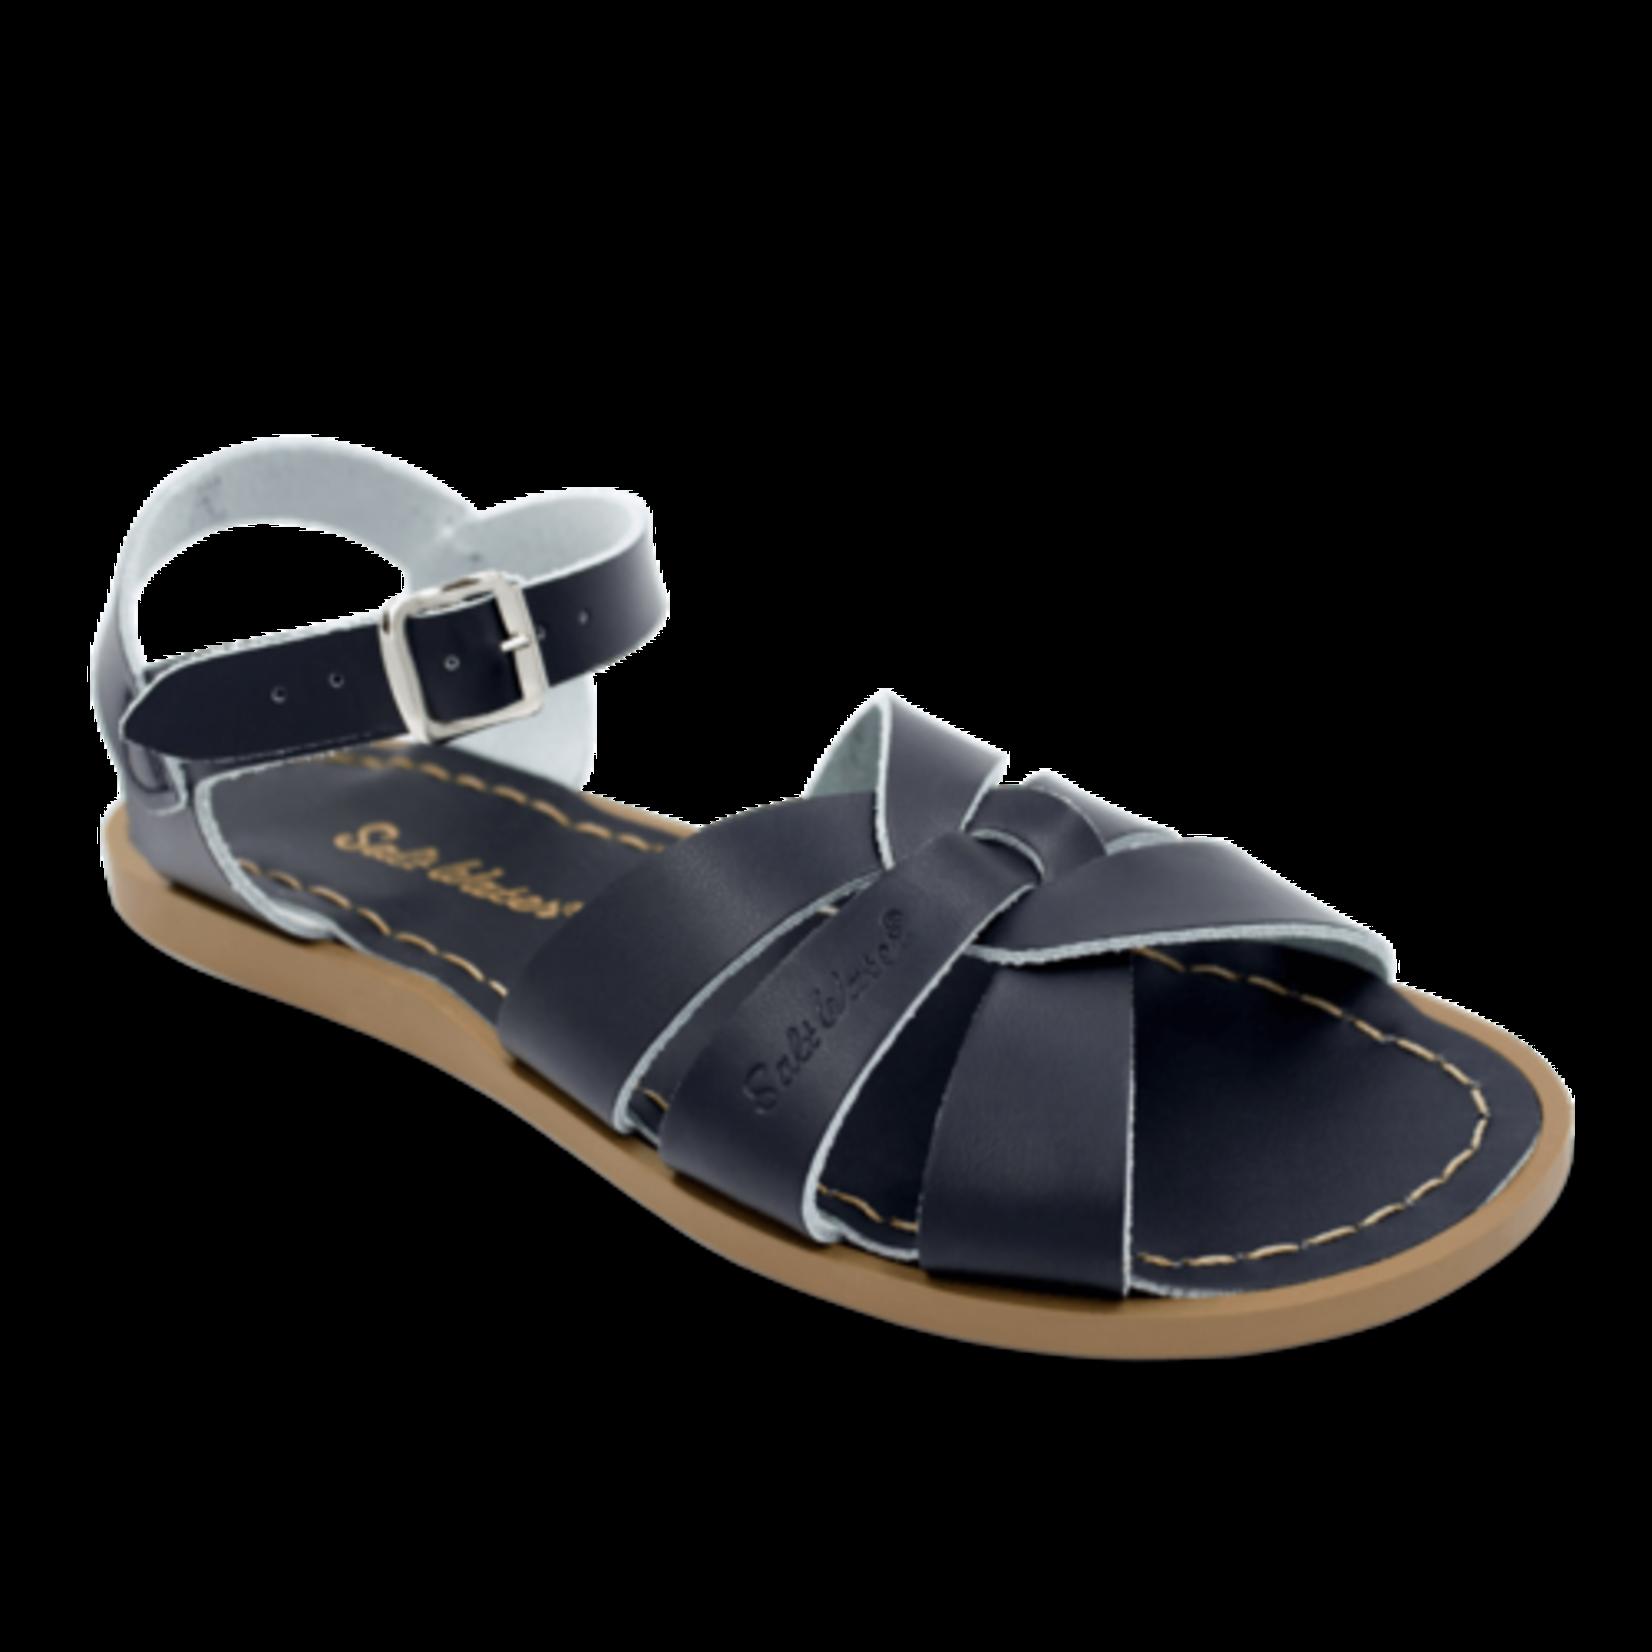 Hoy Shoe Co. Salt Water Sandals Black